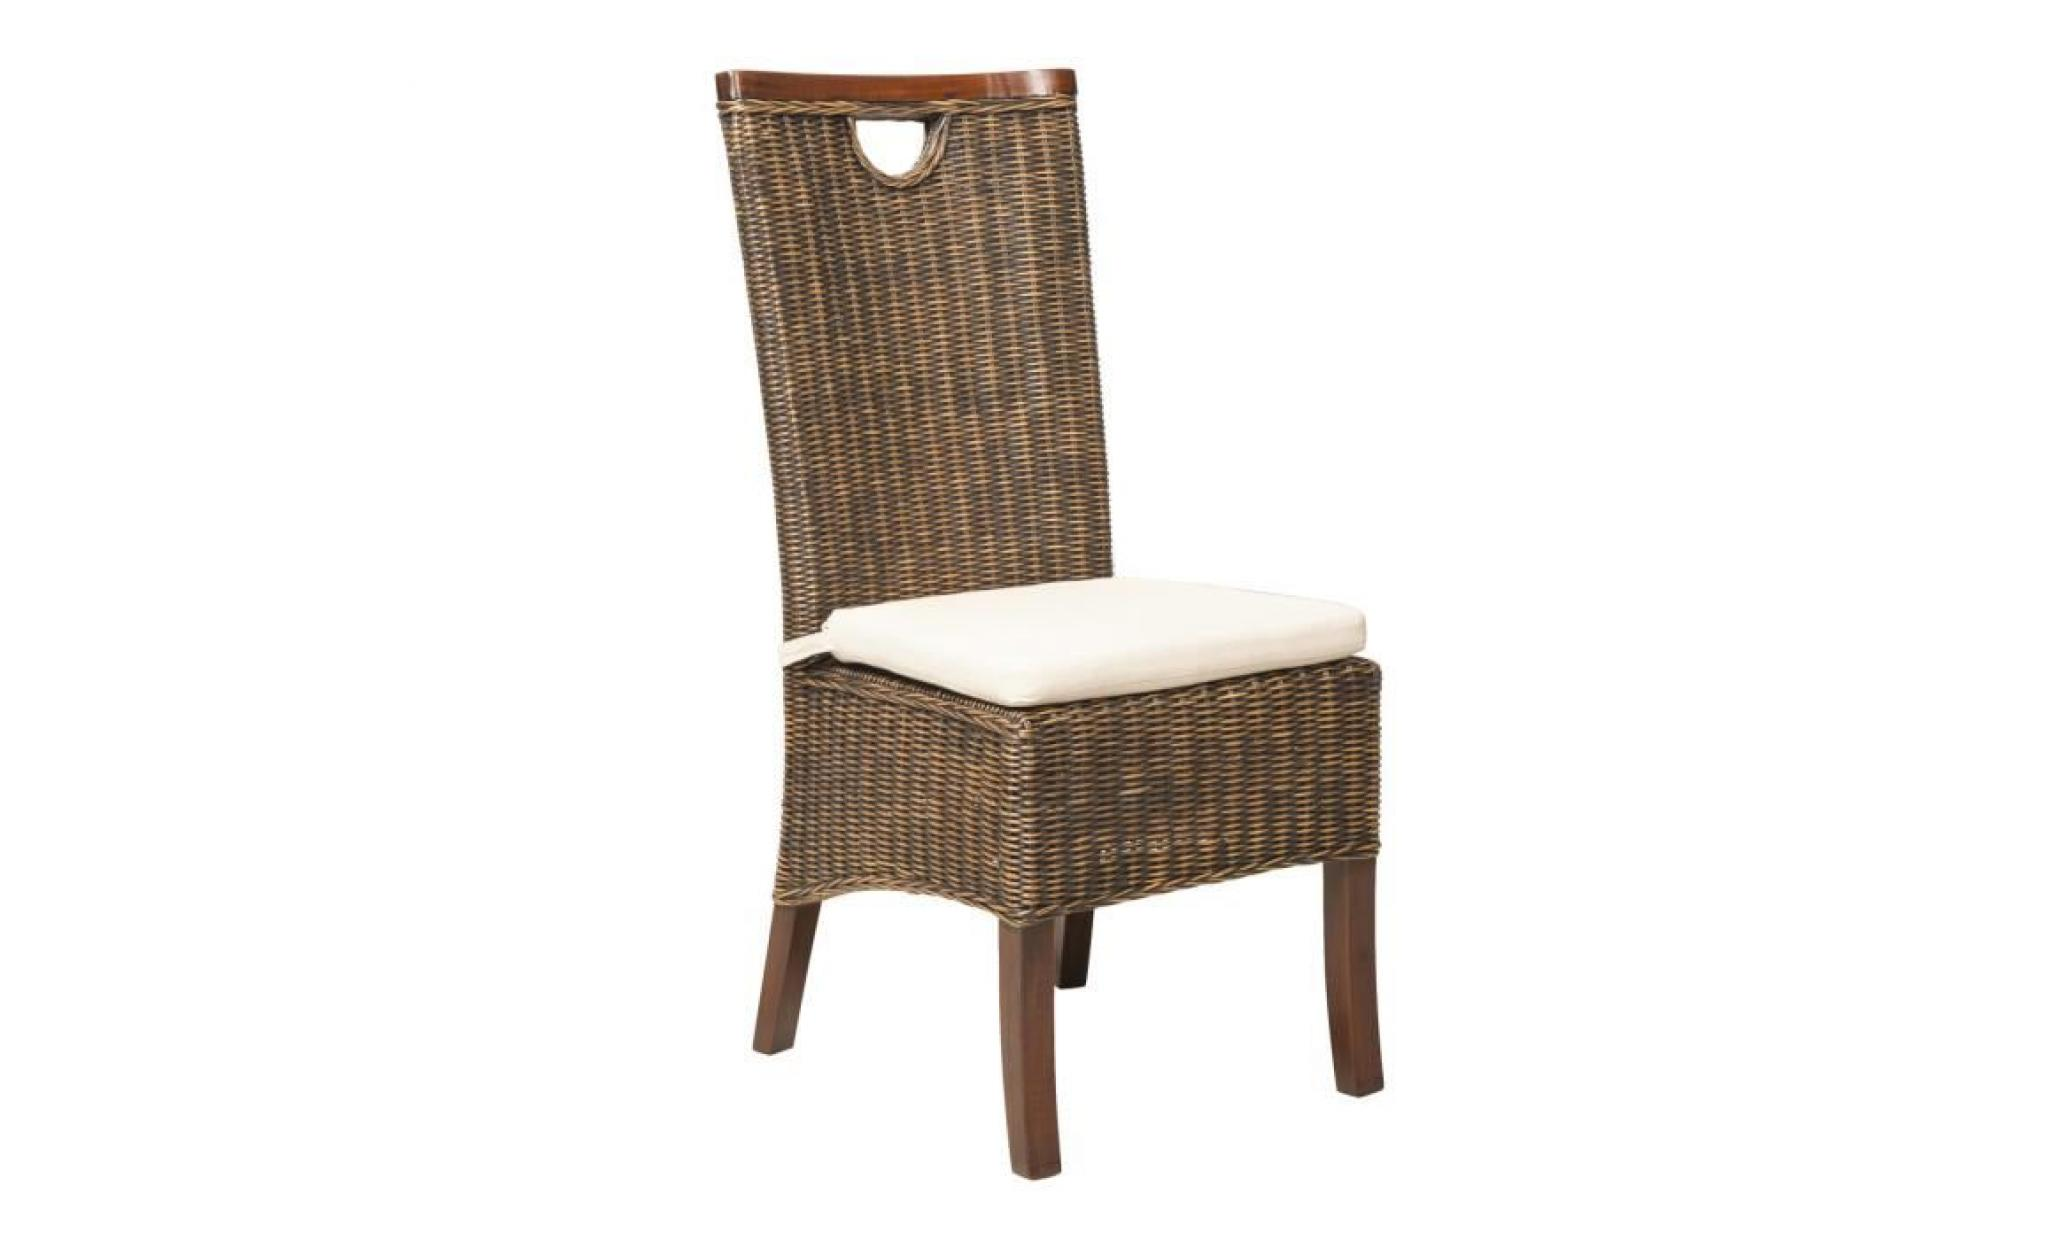 Lot 6 chaises racine moka rotin achat vente chaise Chaise de salle a manger en rotin pas cher